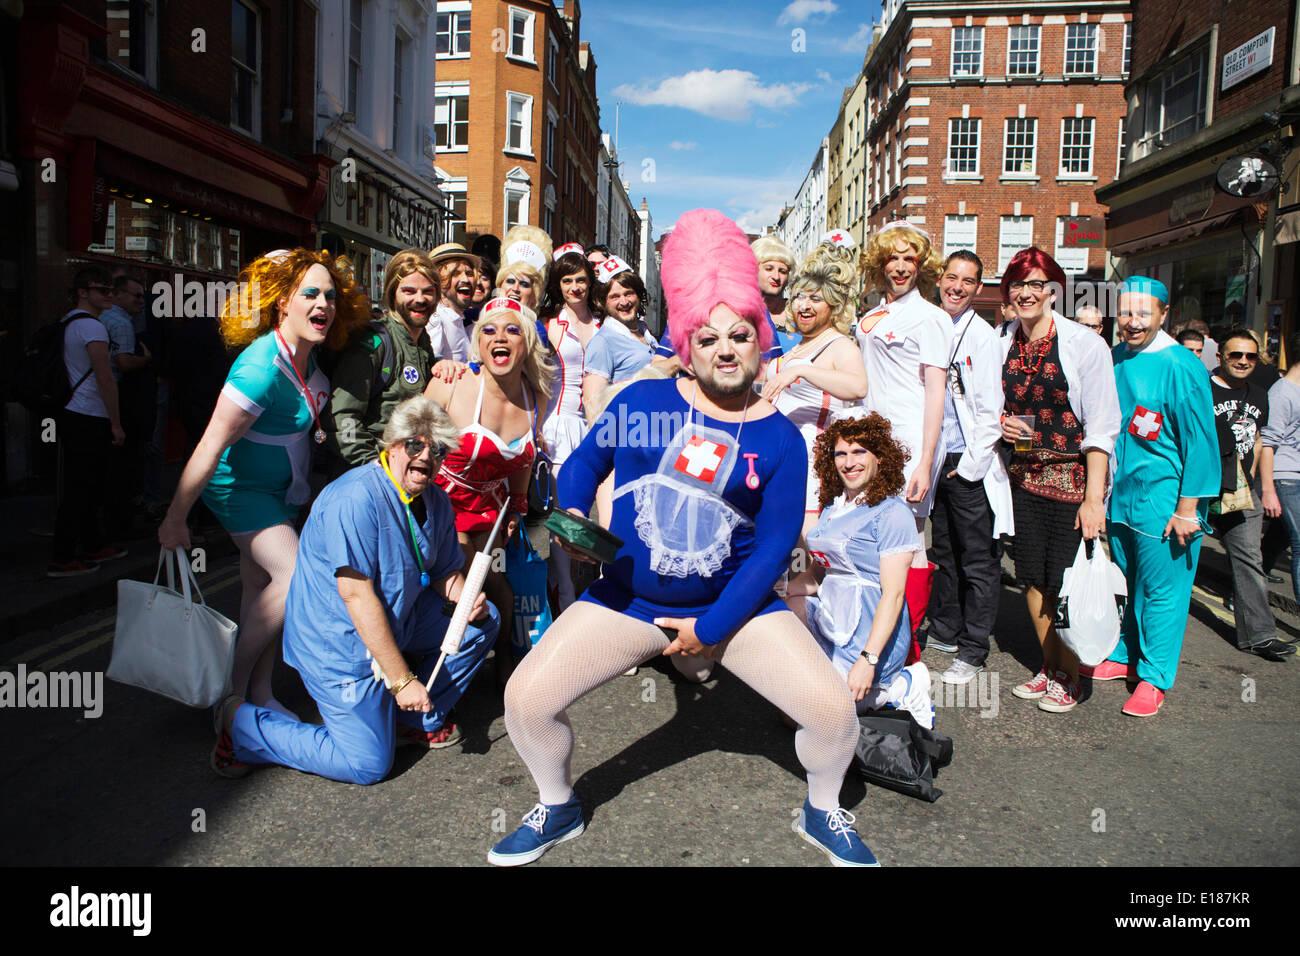 Transvestite clothing uk